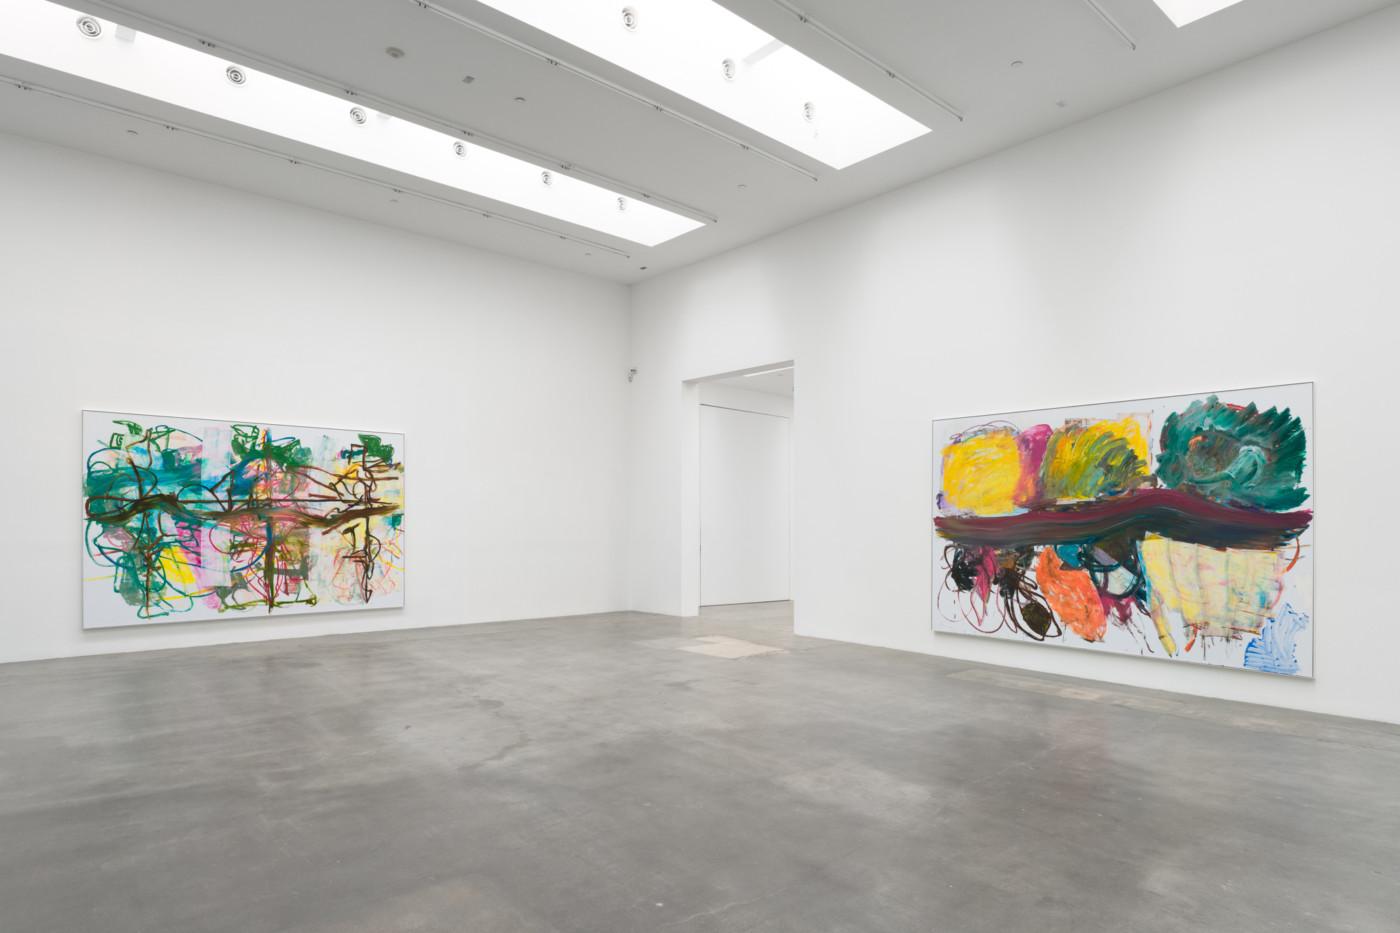 AARON  GARBER-MAIKOVSKA  4 from 3 dancers,  2020, Blum   Poe, Los Angeles, USA, installation view - High Art Gallery Paris